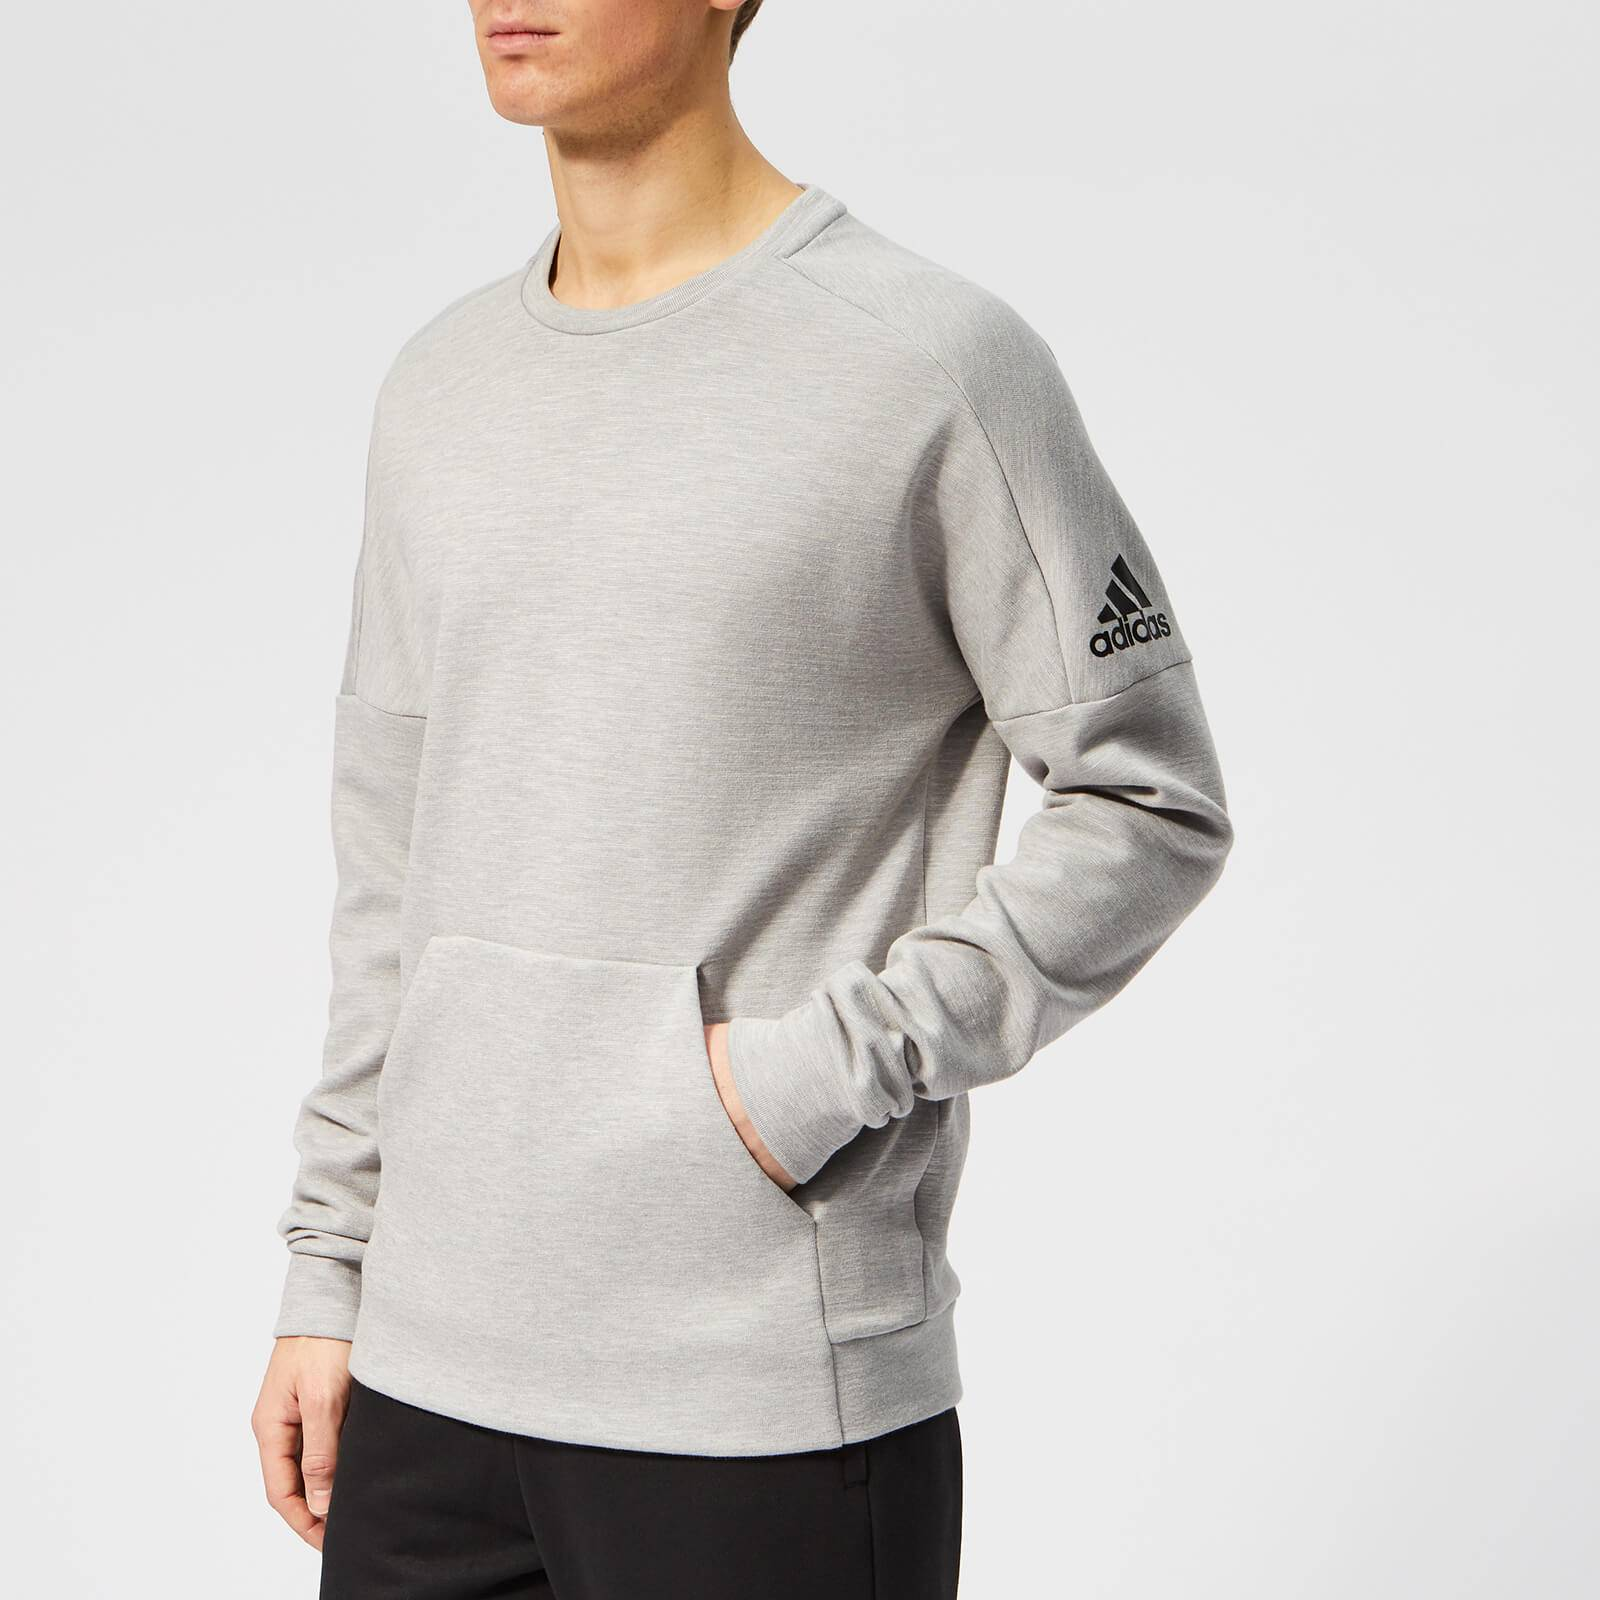 adidas Men's ID Stadium Crew Neck Sweatshirt - Grey Heather - M - Grey